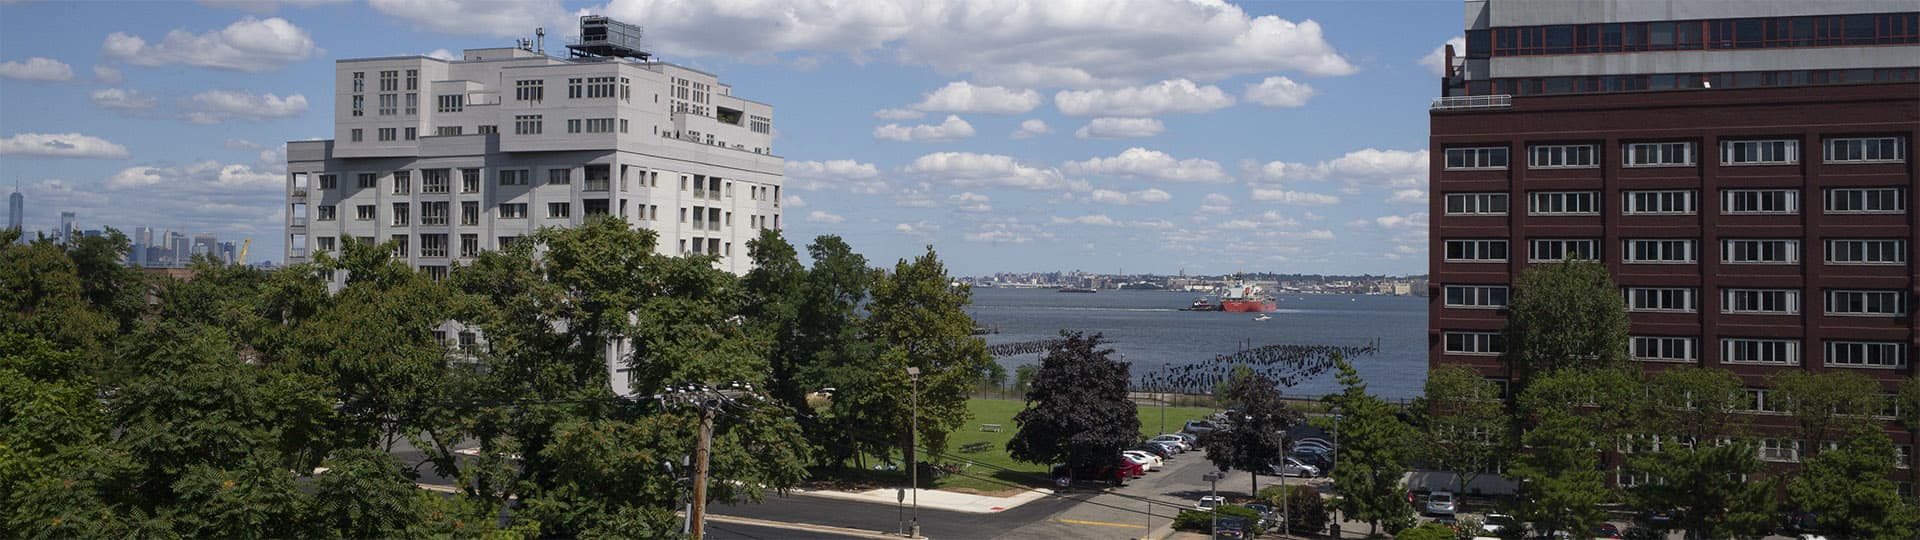 Staten Island, St George, NYC